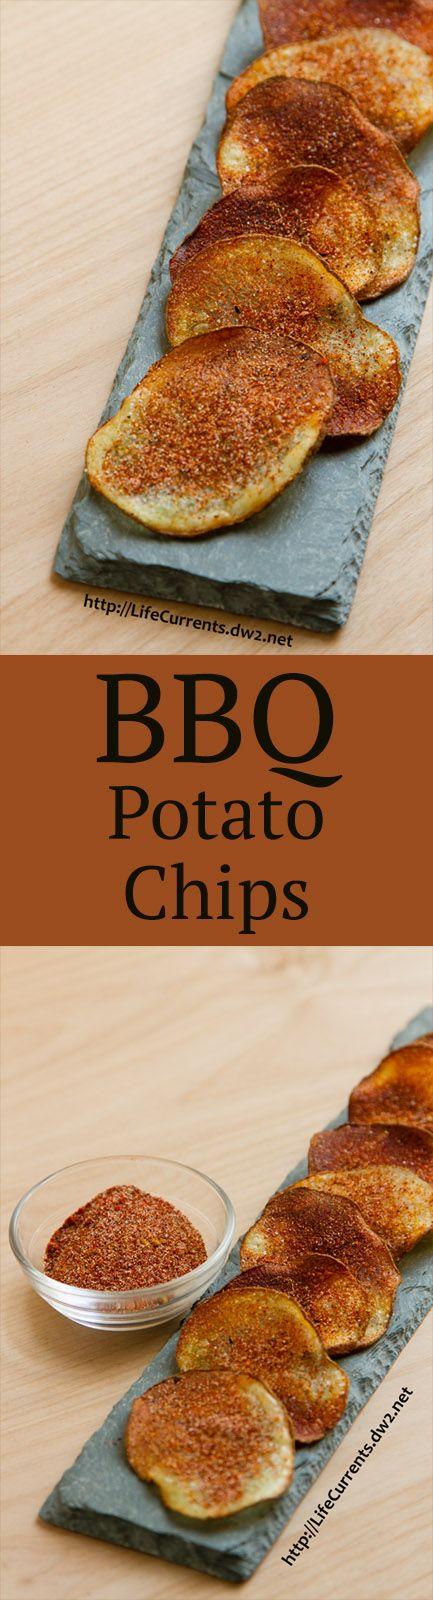 BBQ Potato Chips - Life Currents